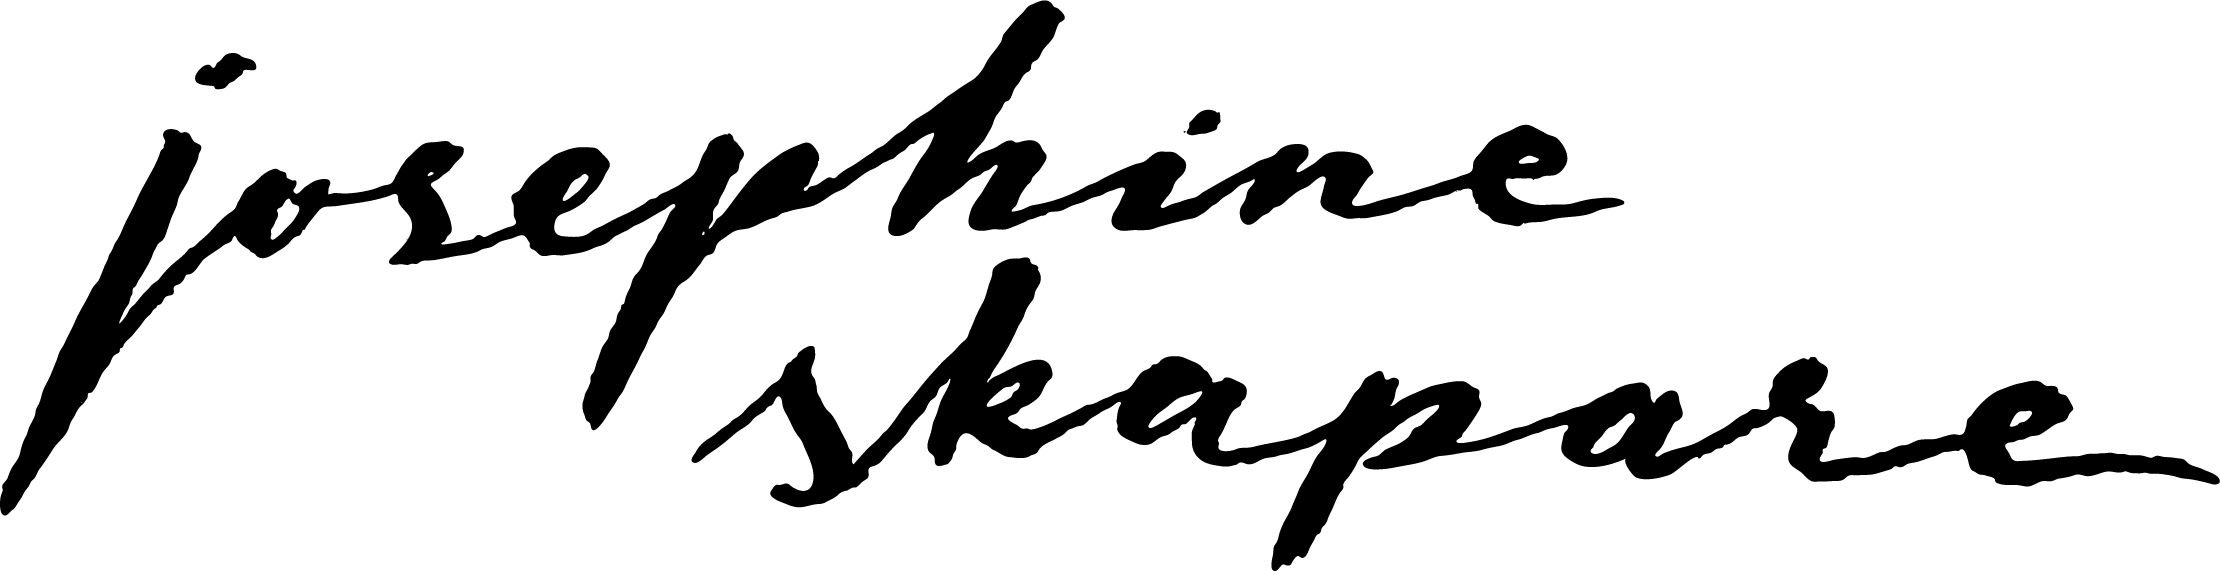 Vegangodis-logo-2